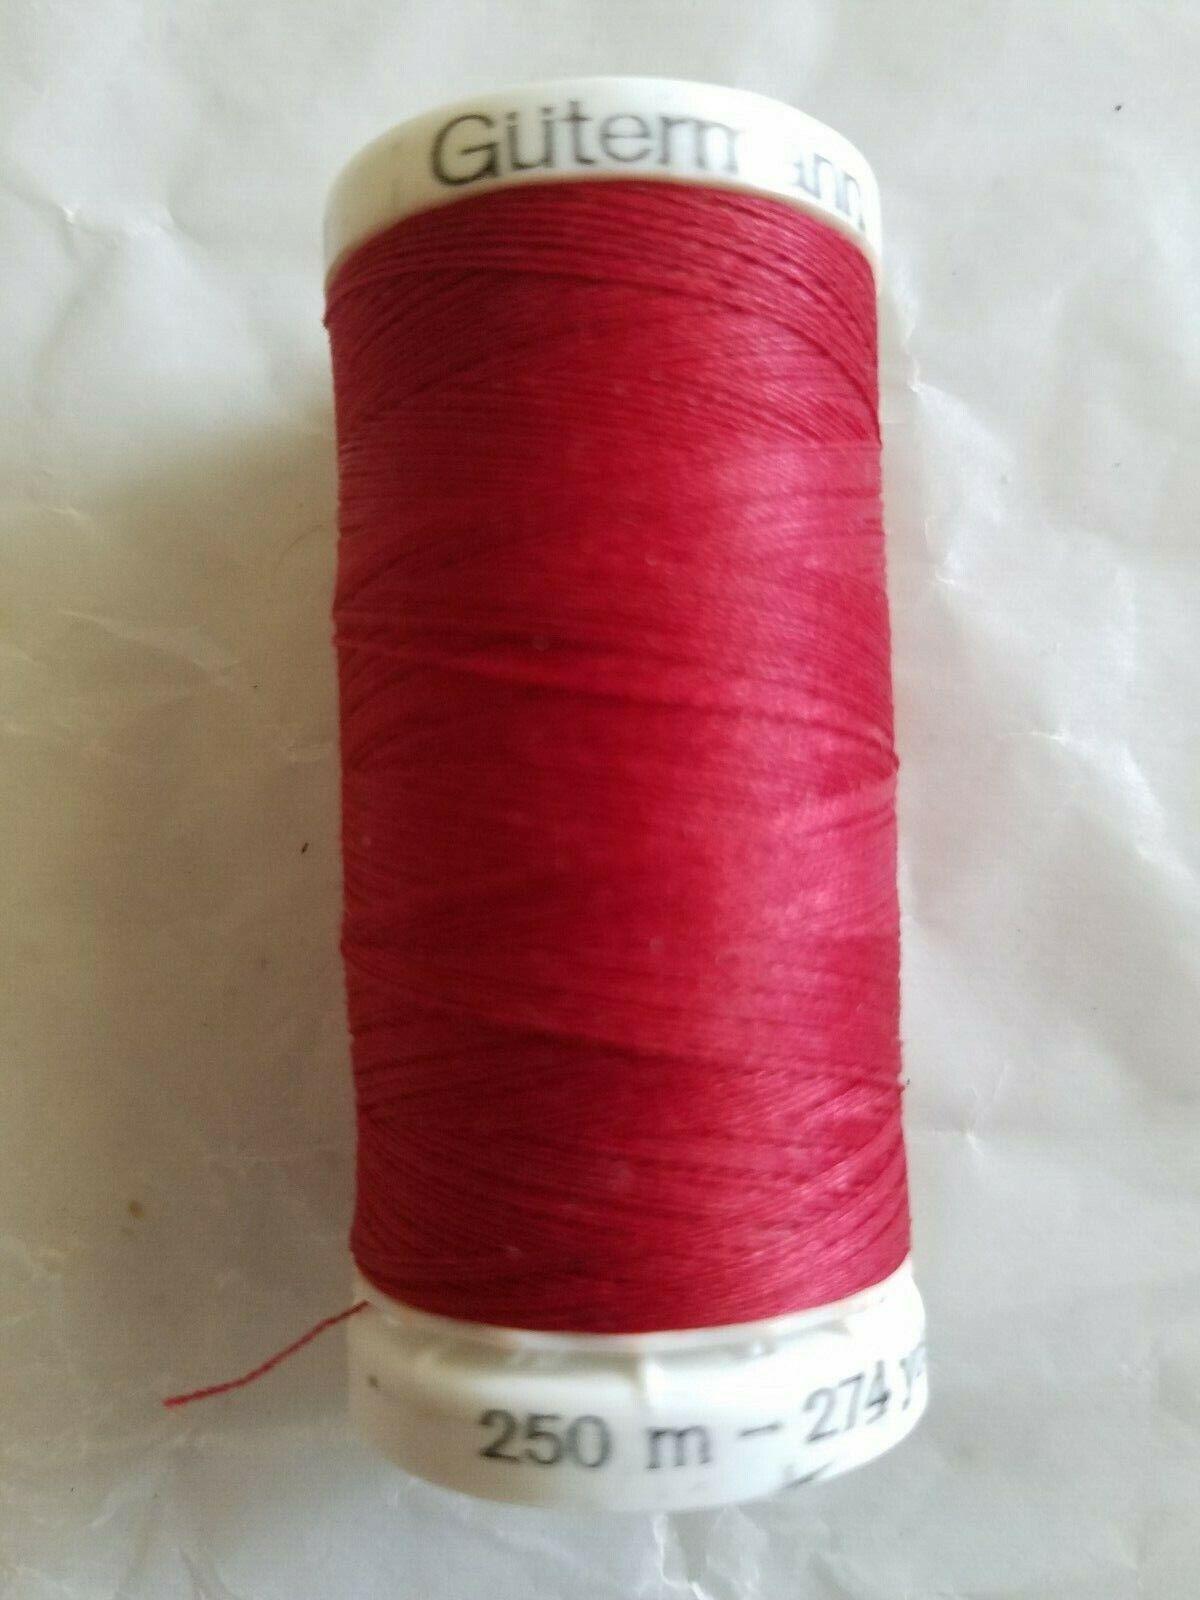 Gutermann Sew-All Thread 274yd-Tile Blue 250P-224